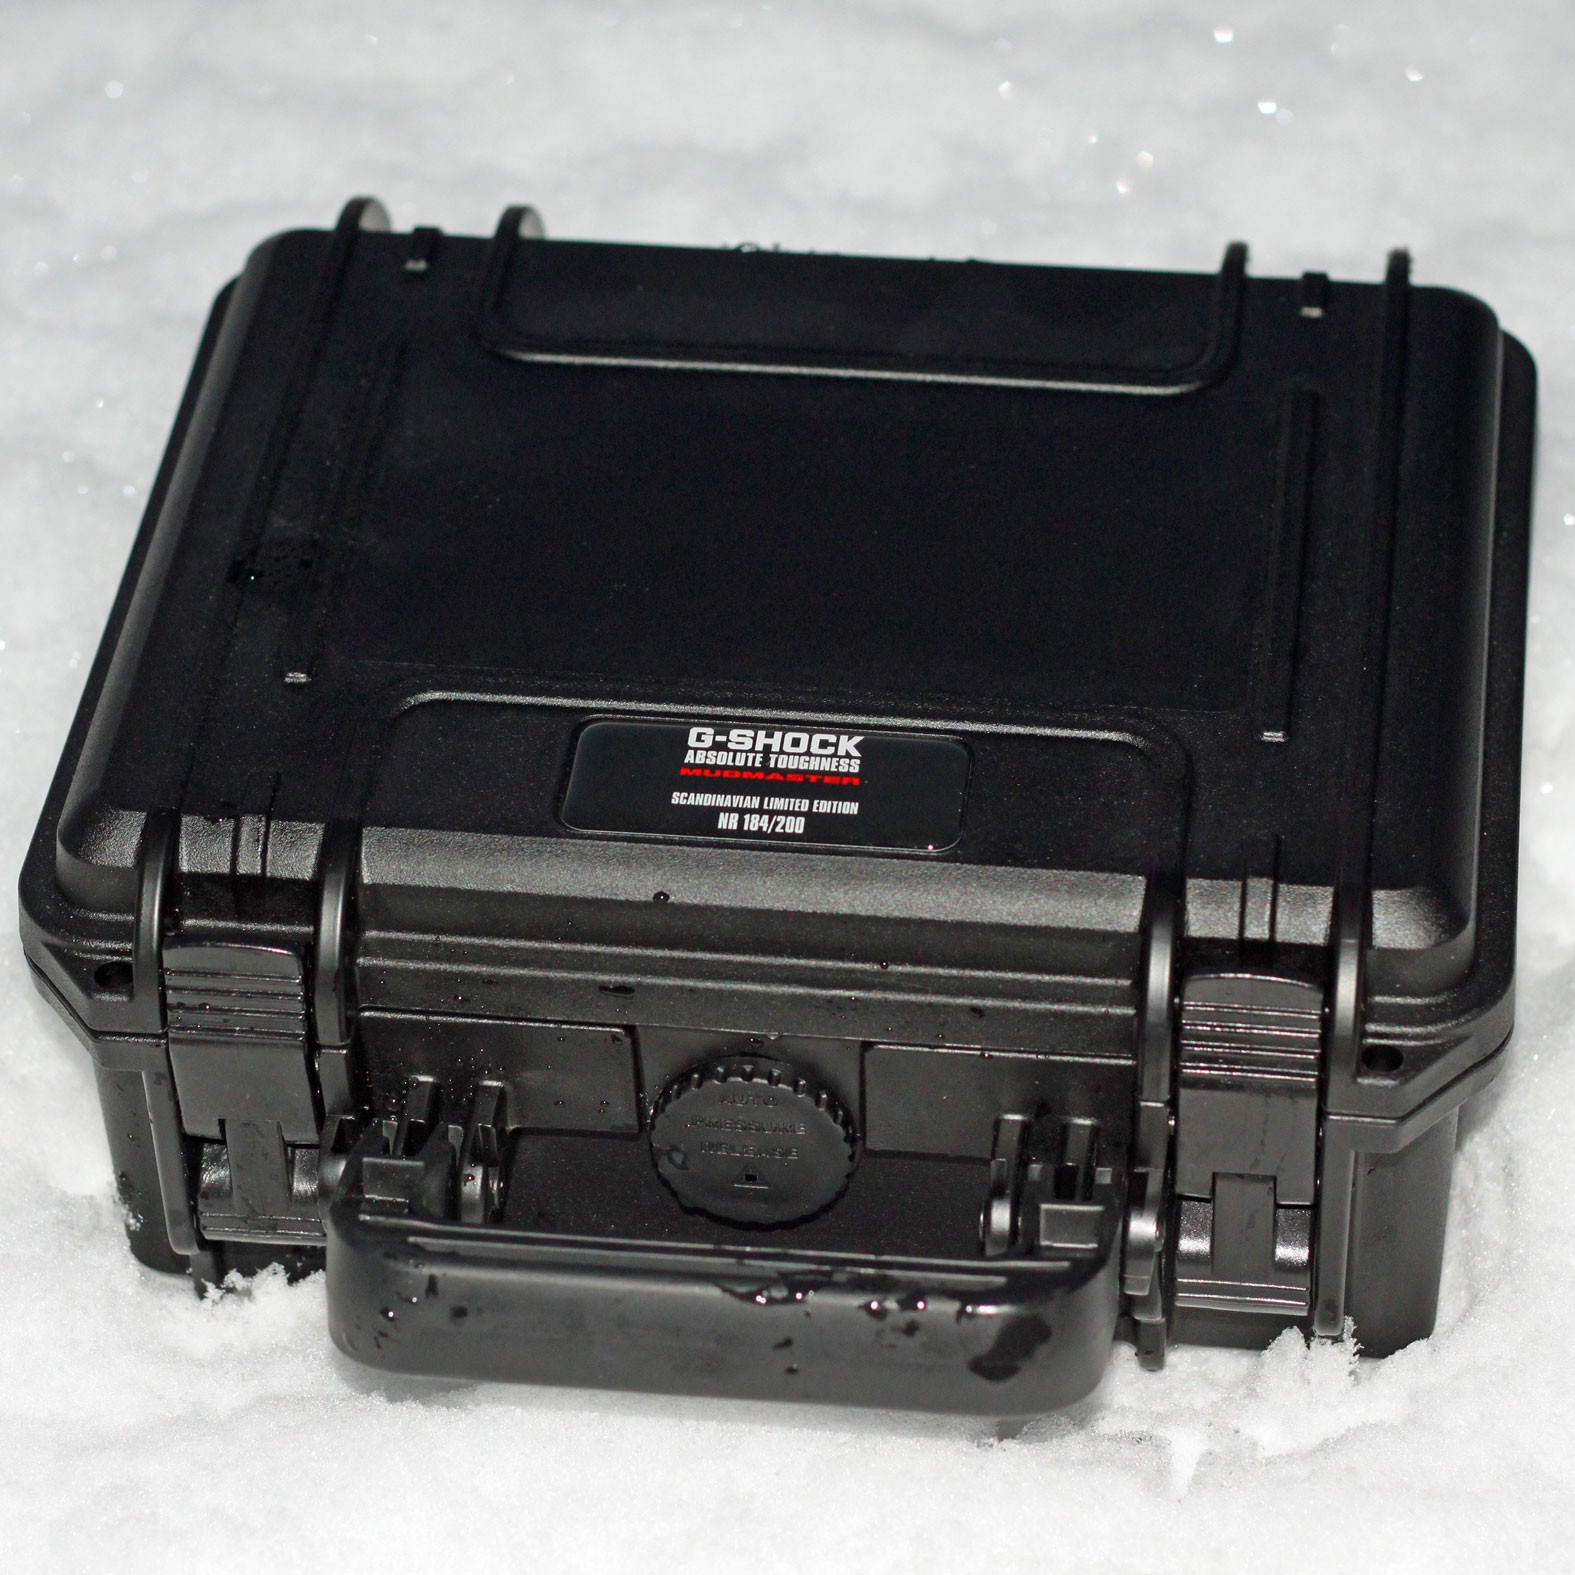 g-shock-mudmaster-limited-edition-scandinavia-suitcase-pelican-03